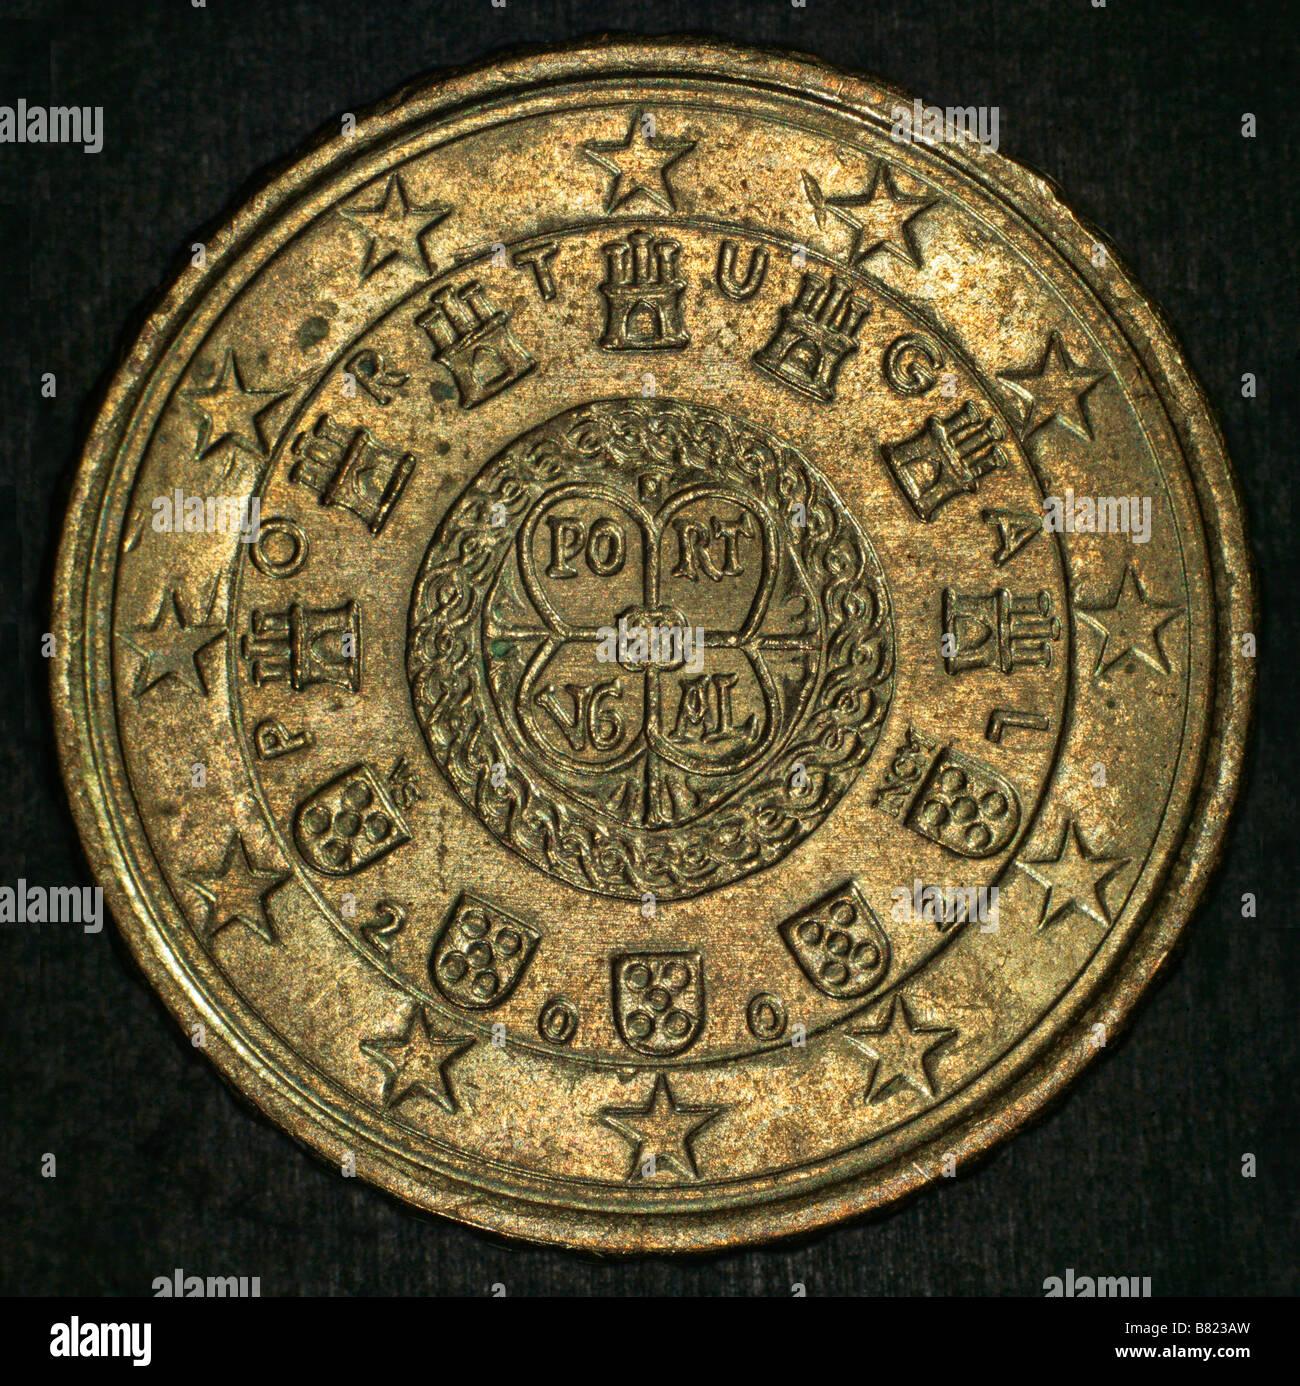 10 Euro cent coin axial illumination - Stock Image